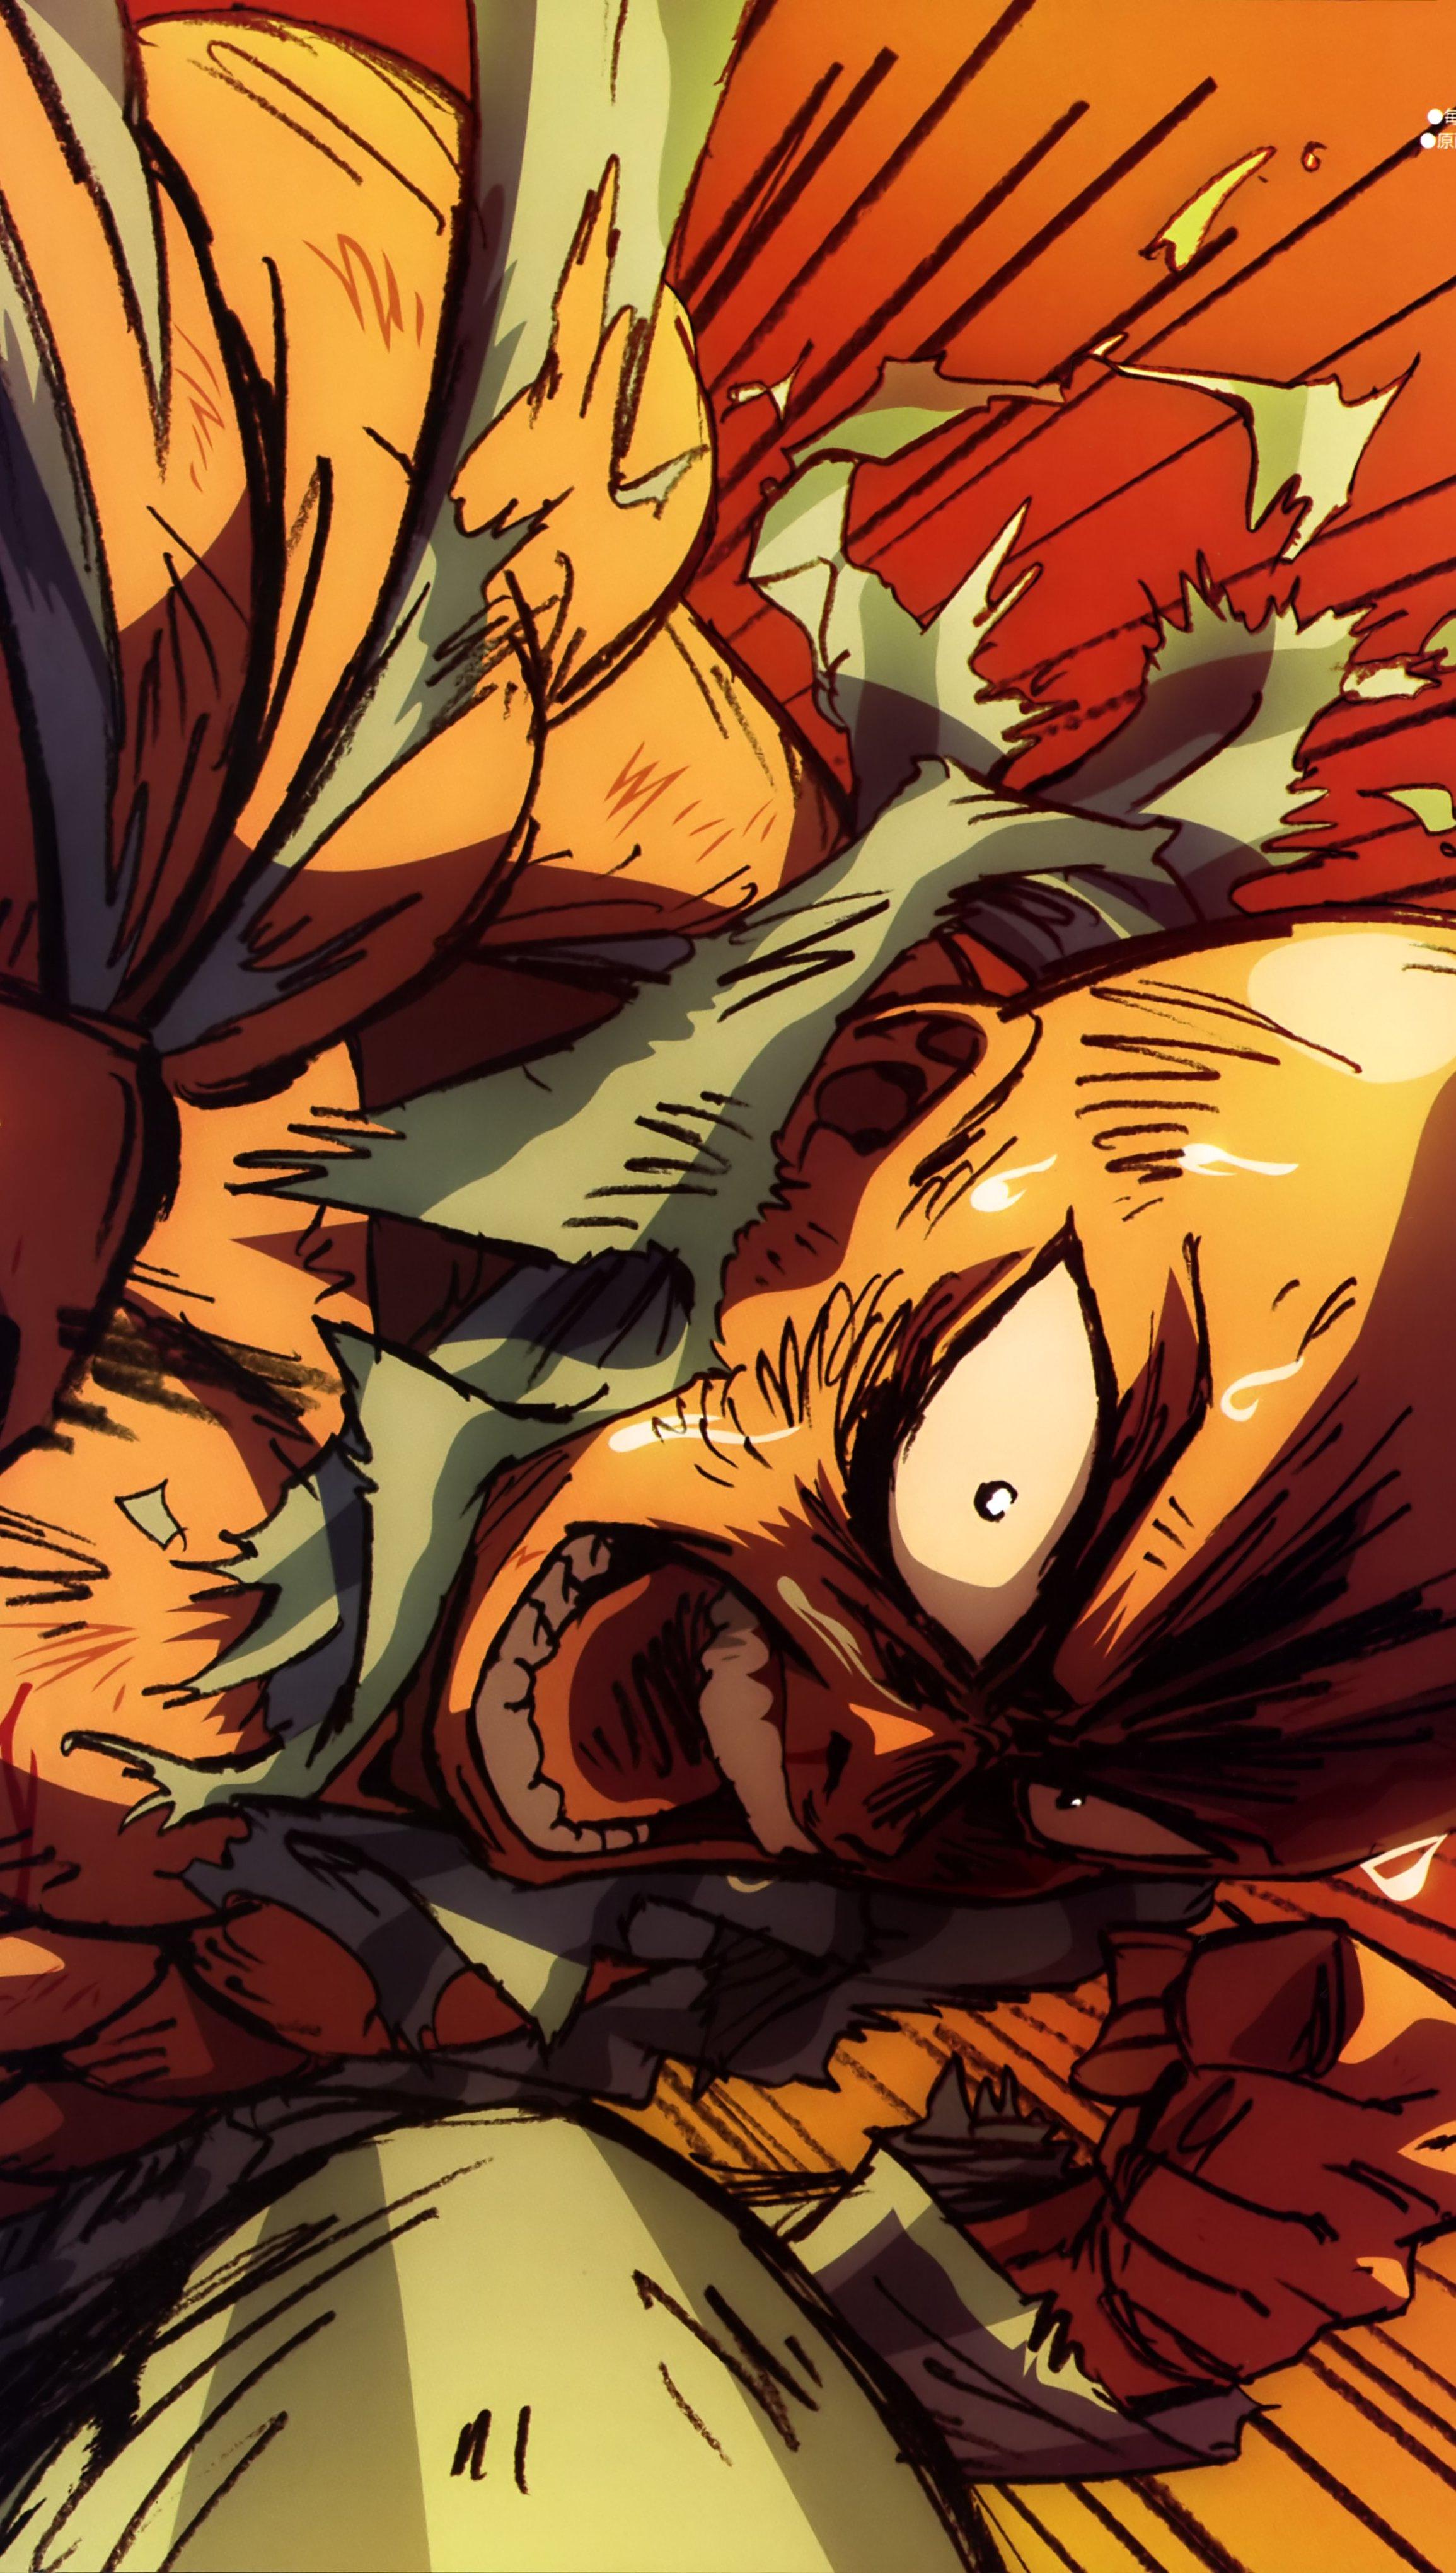 Fondos de pantalla Anime Saitama One Punch Man Vertical